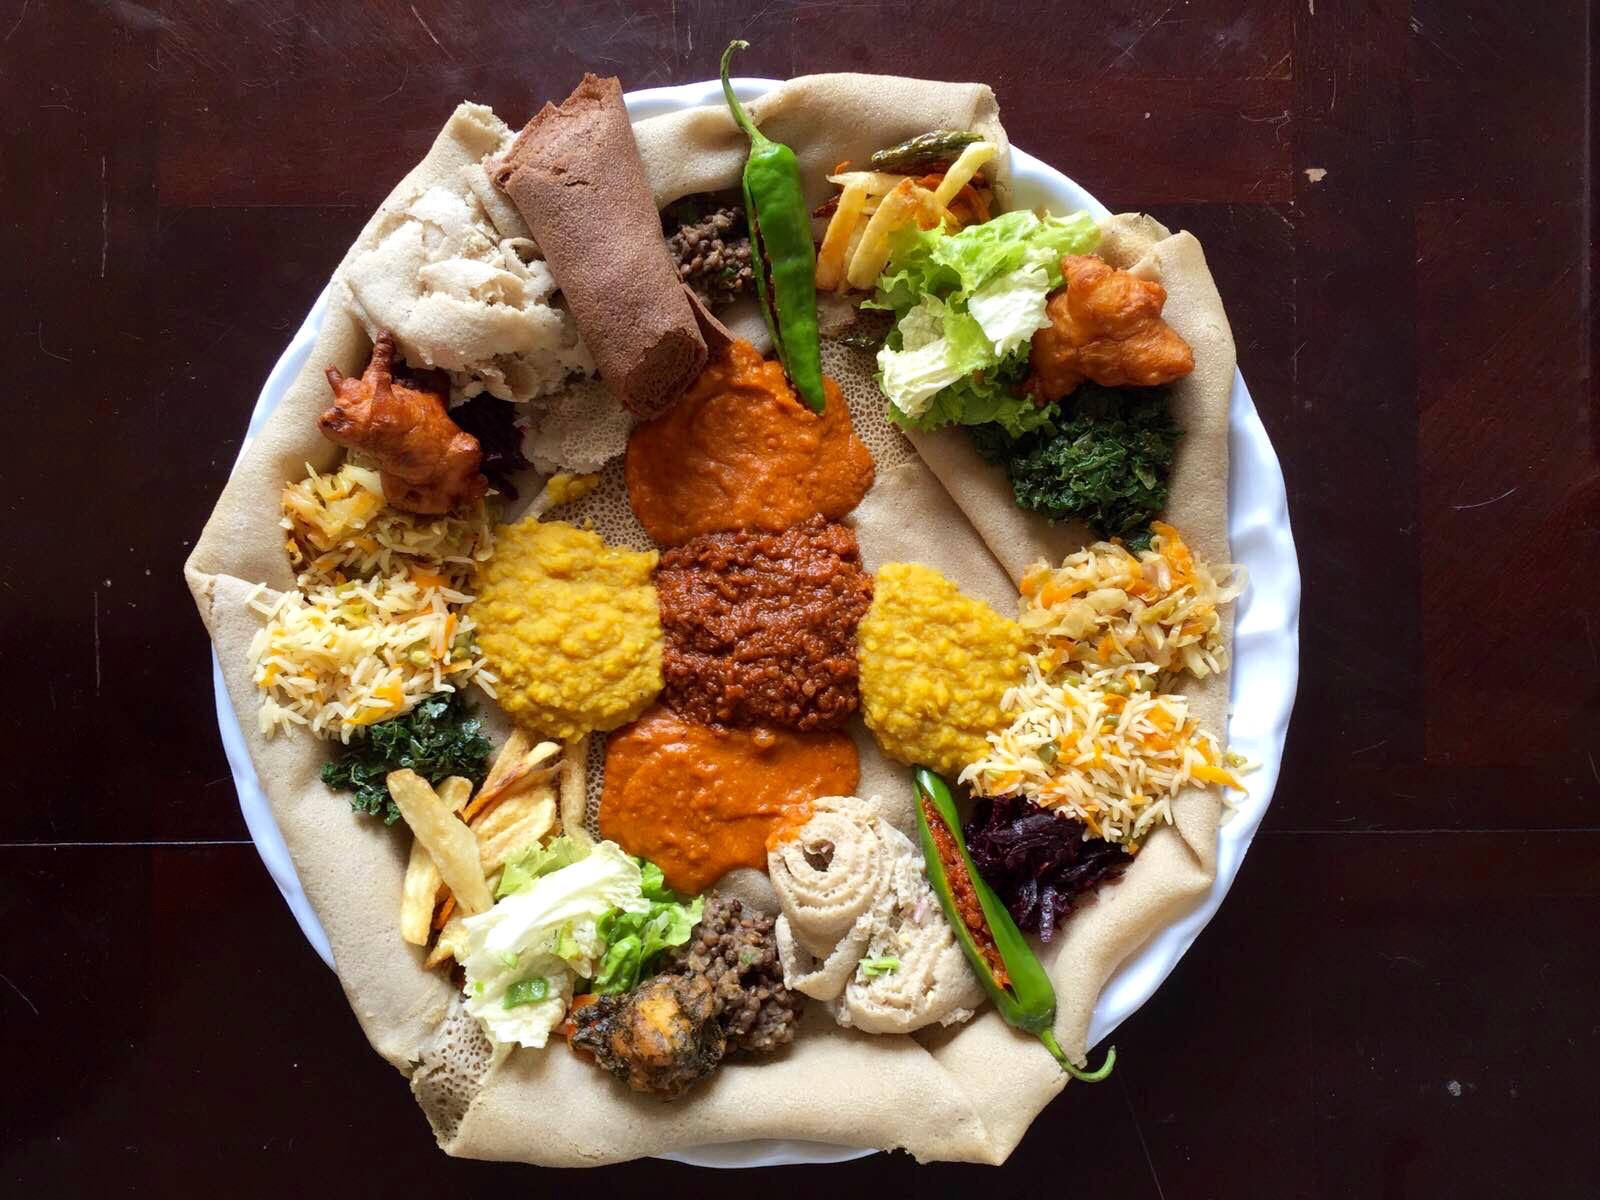 'Beyaynetu' - a vegan platter